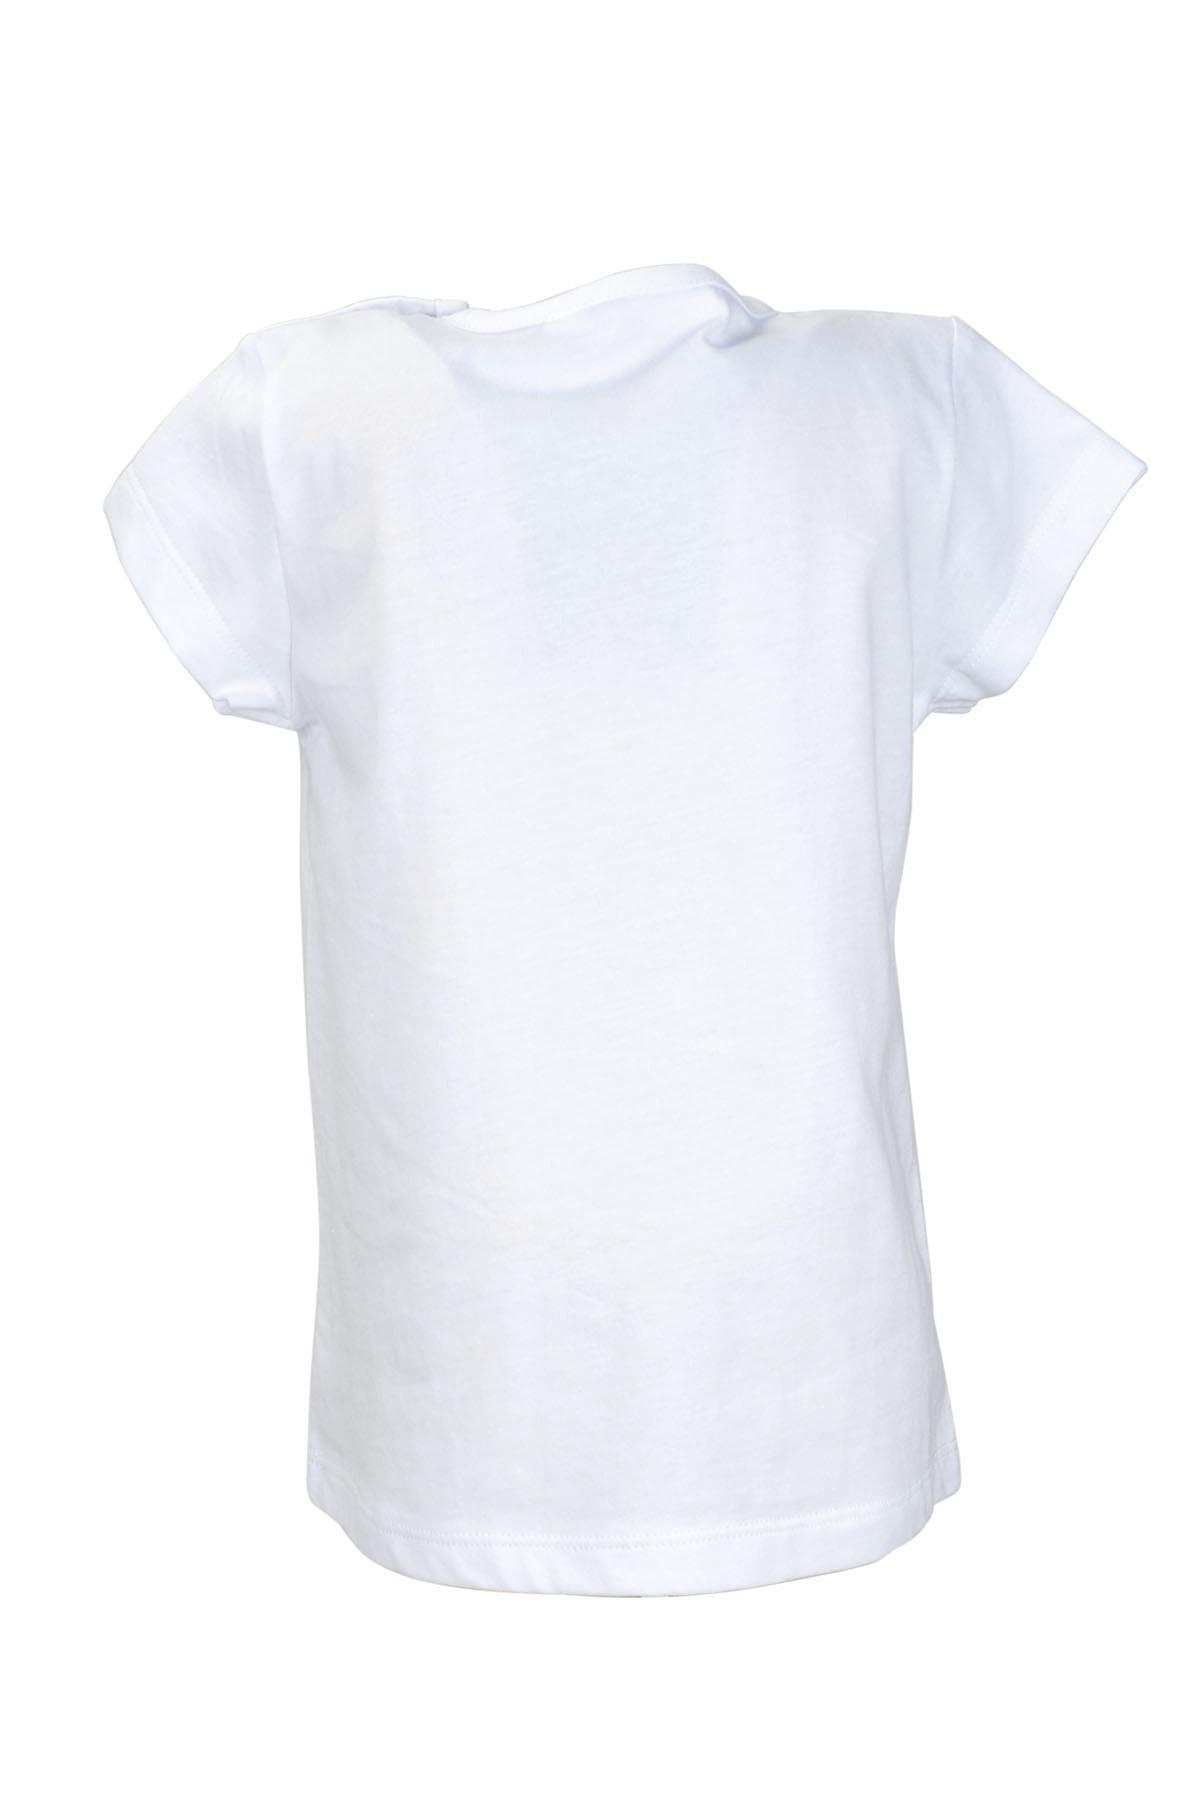 Zeyland Kız Bebek Beyaz Tshirt 2